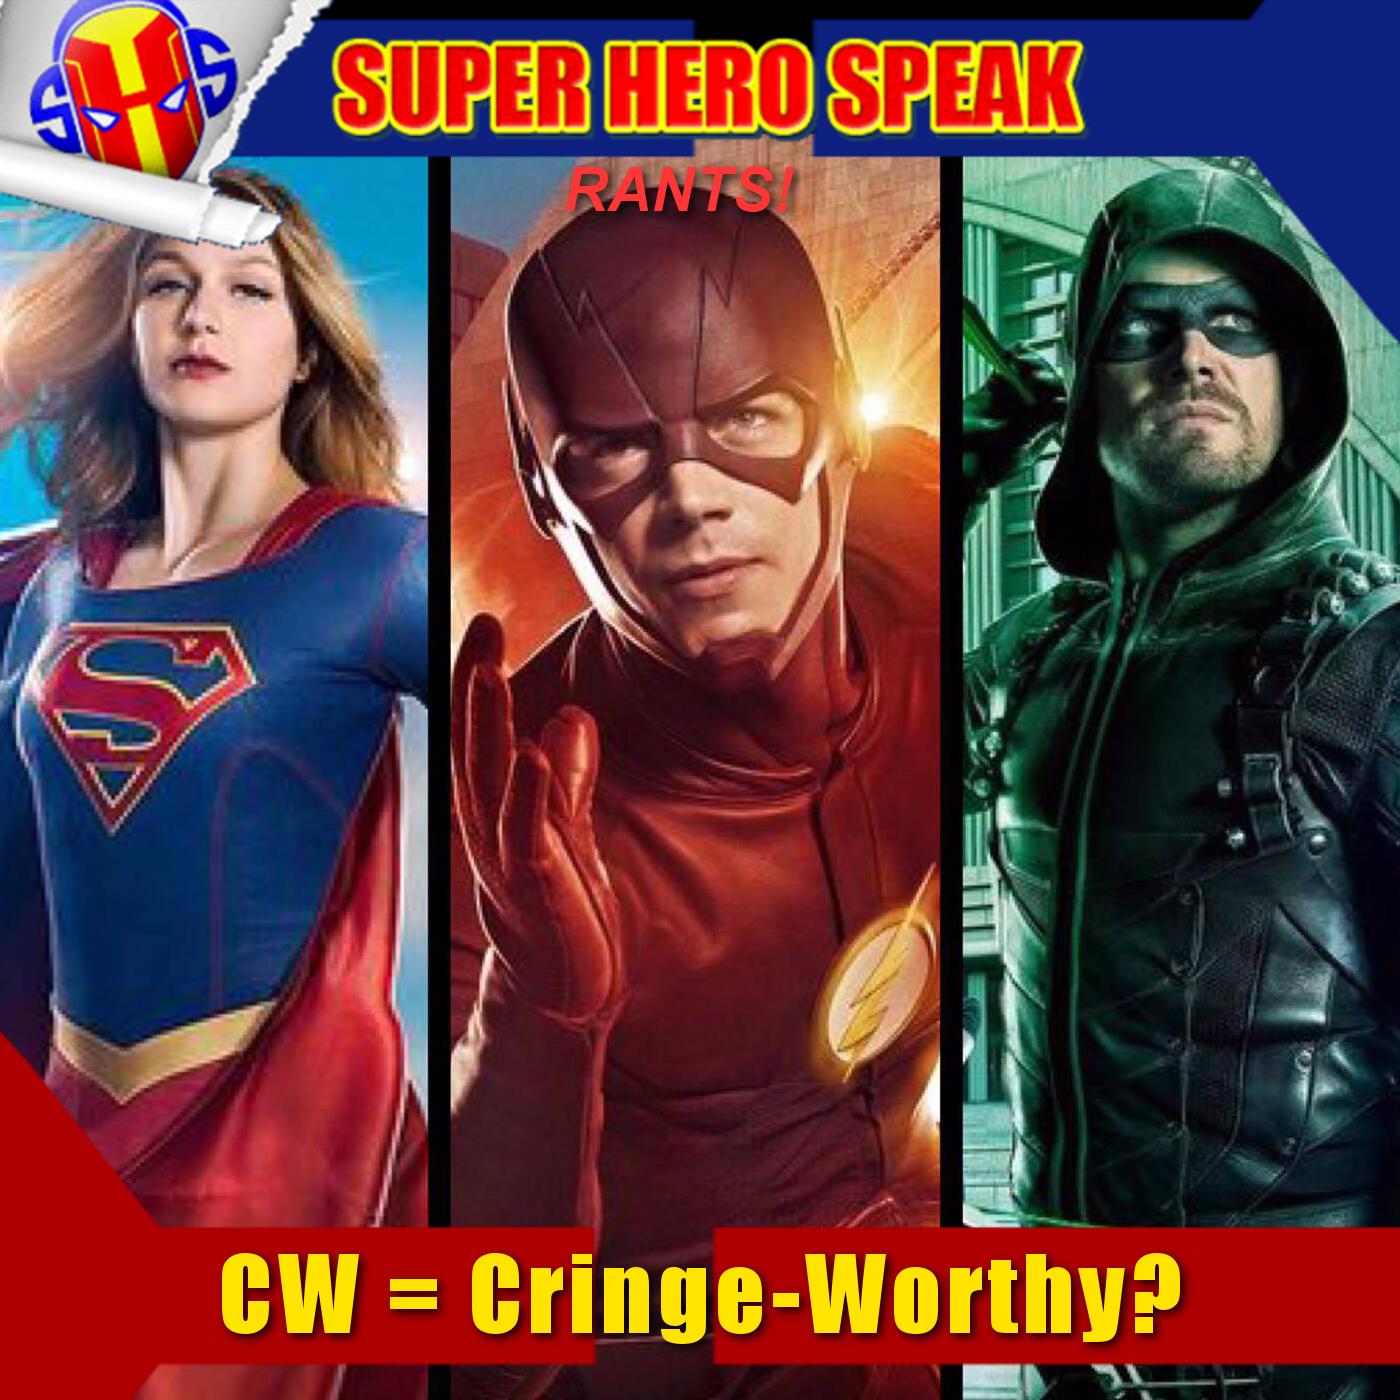 CW = Cringe-Worthy?